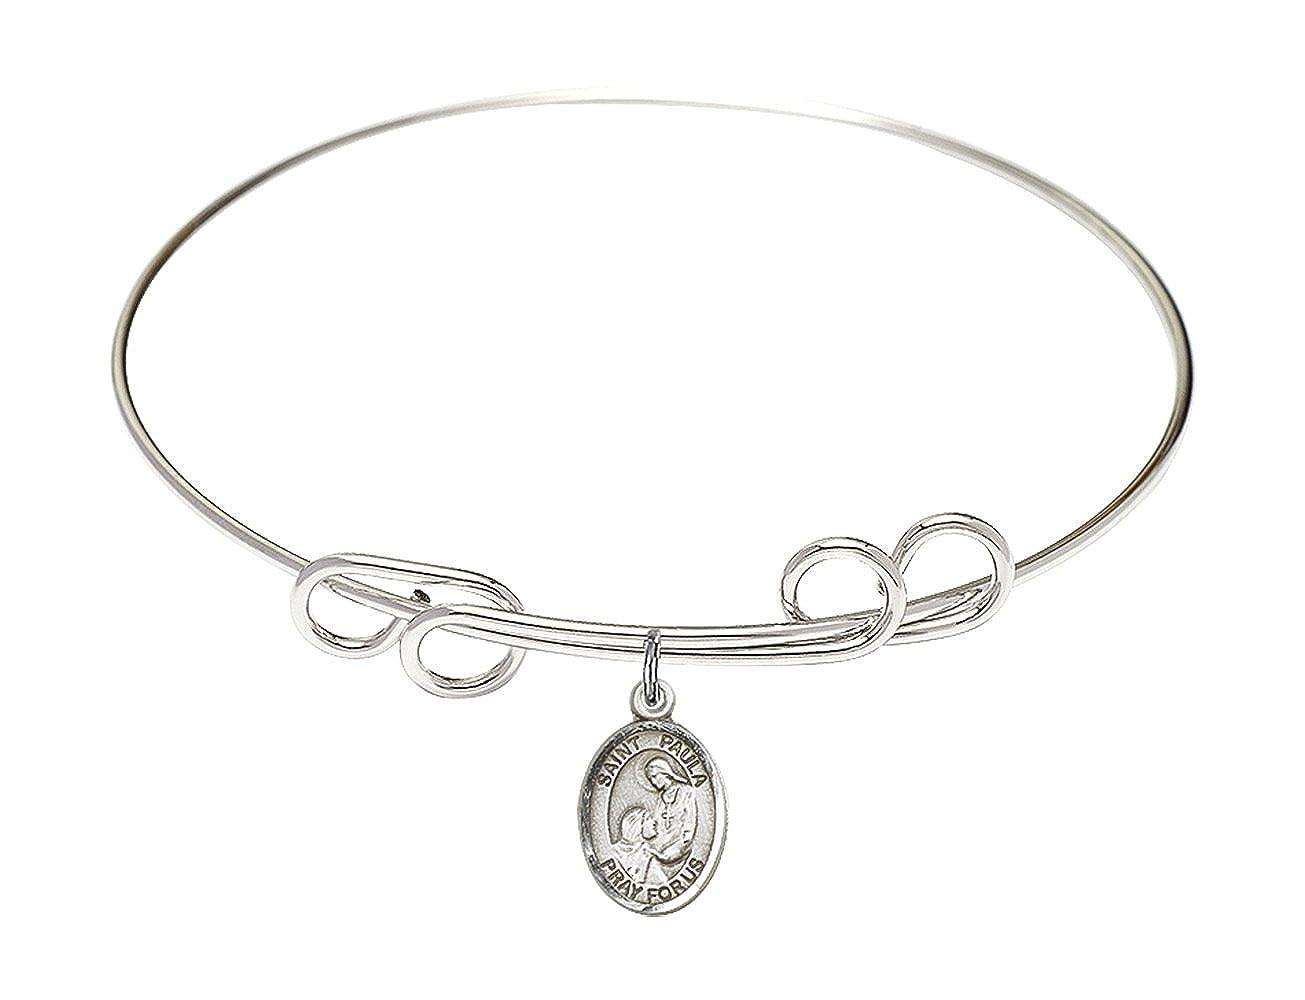 DiamondJewelryNY Double Loop Bangle Bracelet with a St Paula Charm.